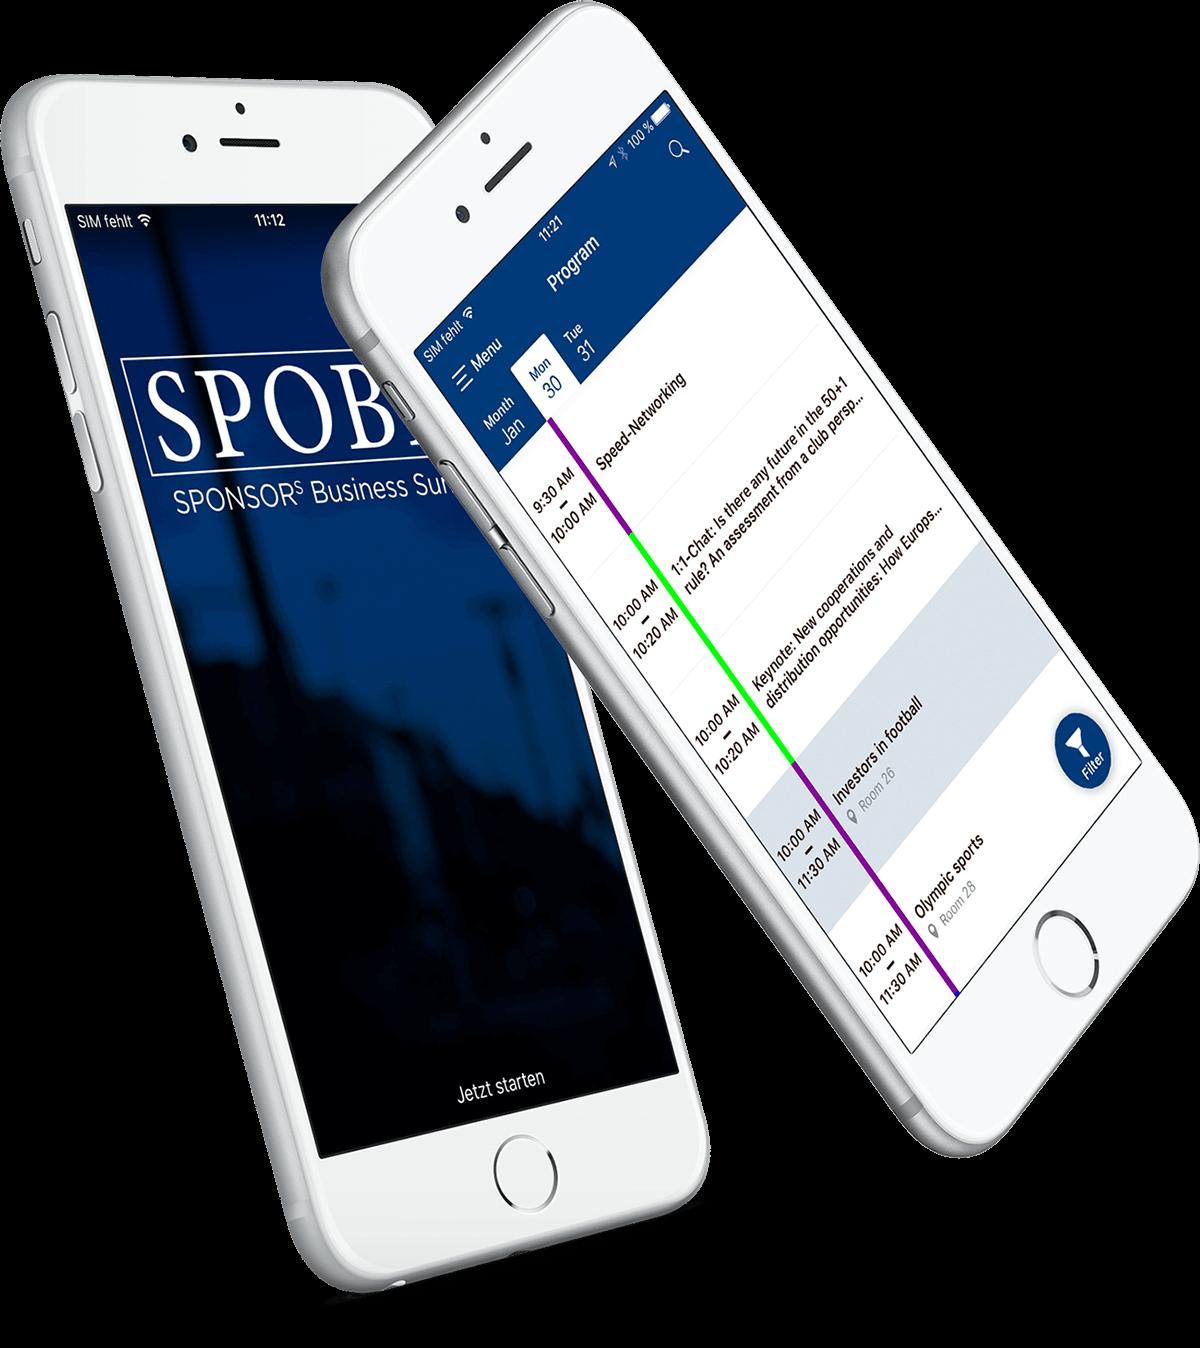 SpoBis 2017 App